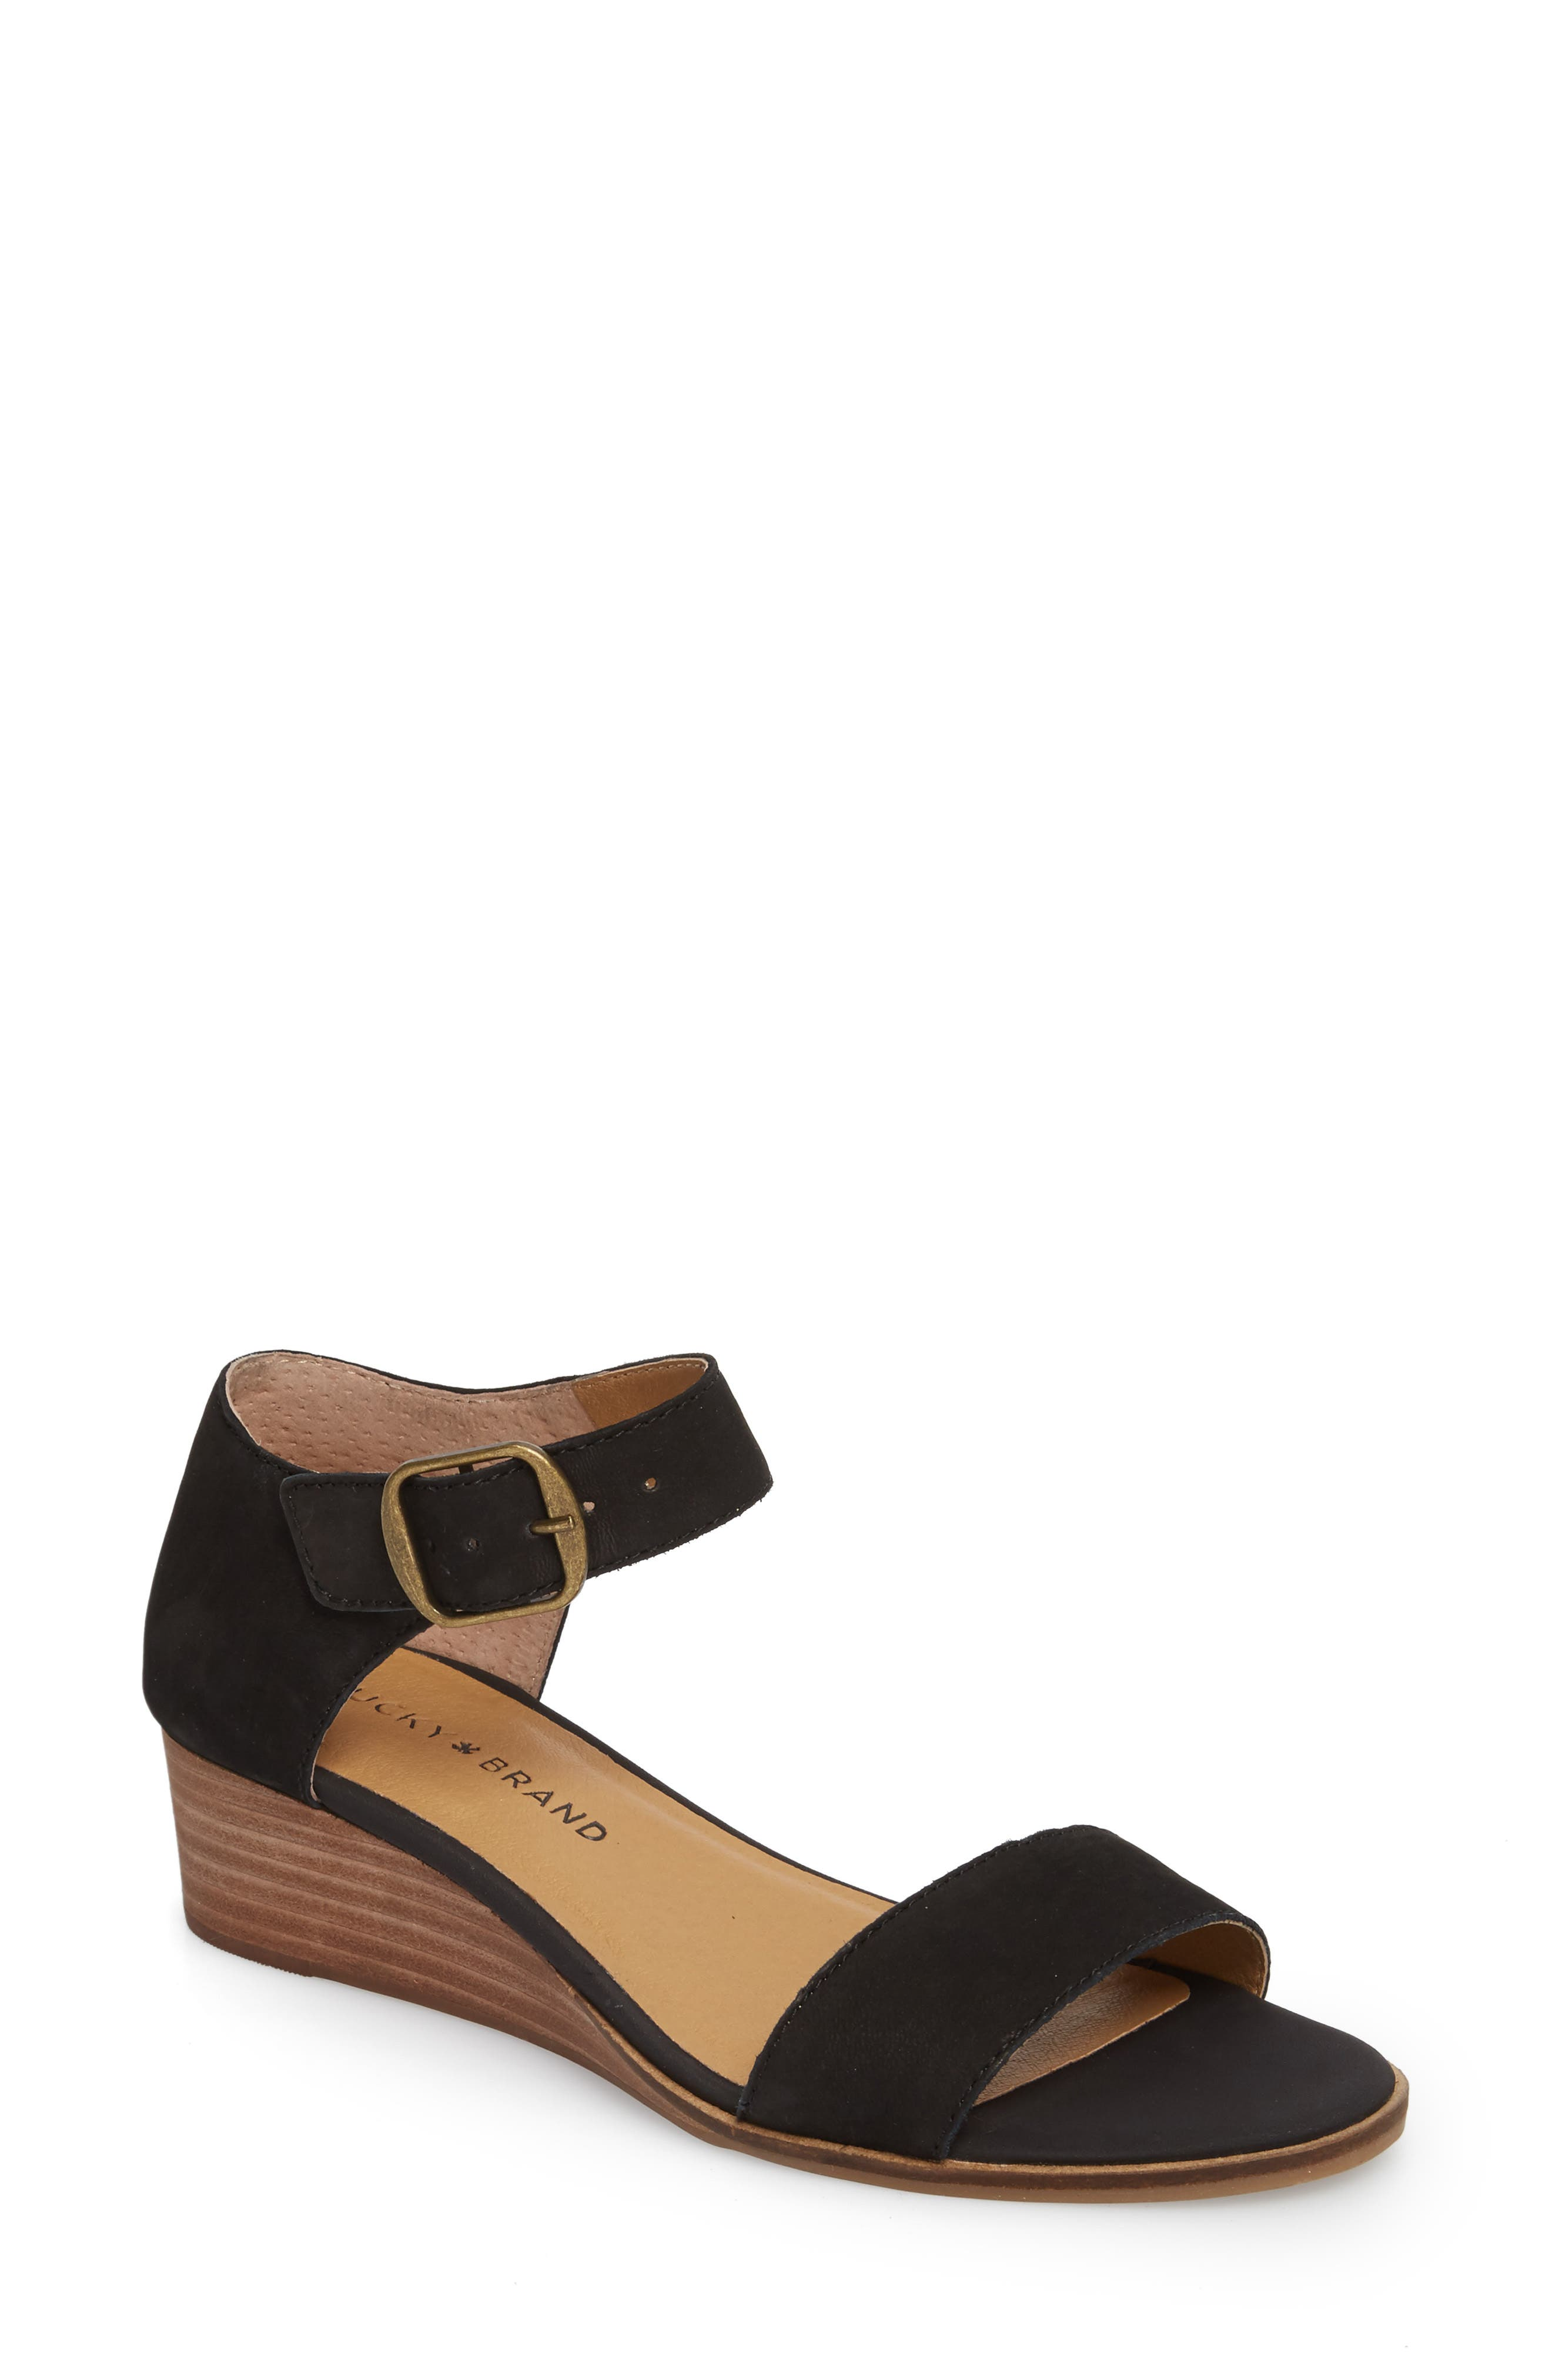 Riamsee Sandal,                         Main,                         color,